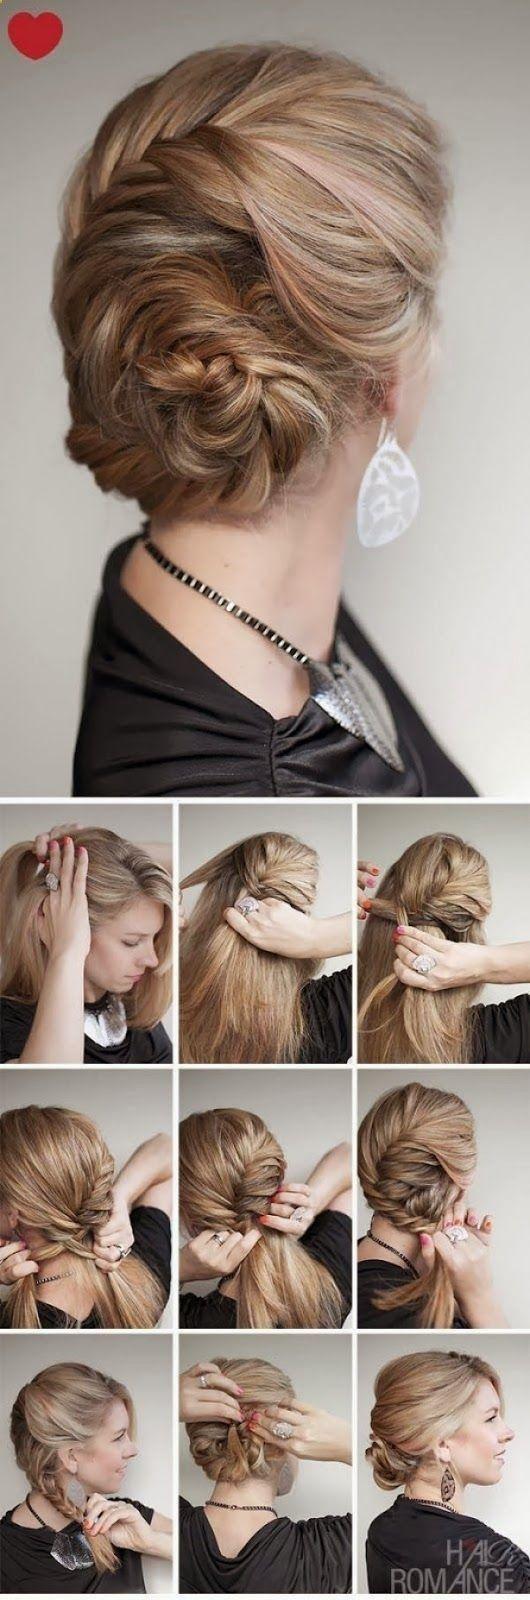 Hair Styles Tutorials: Kinda reminds me of Elsas hair on Frozen ;)